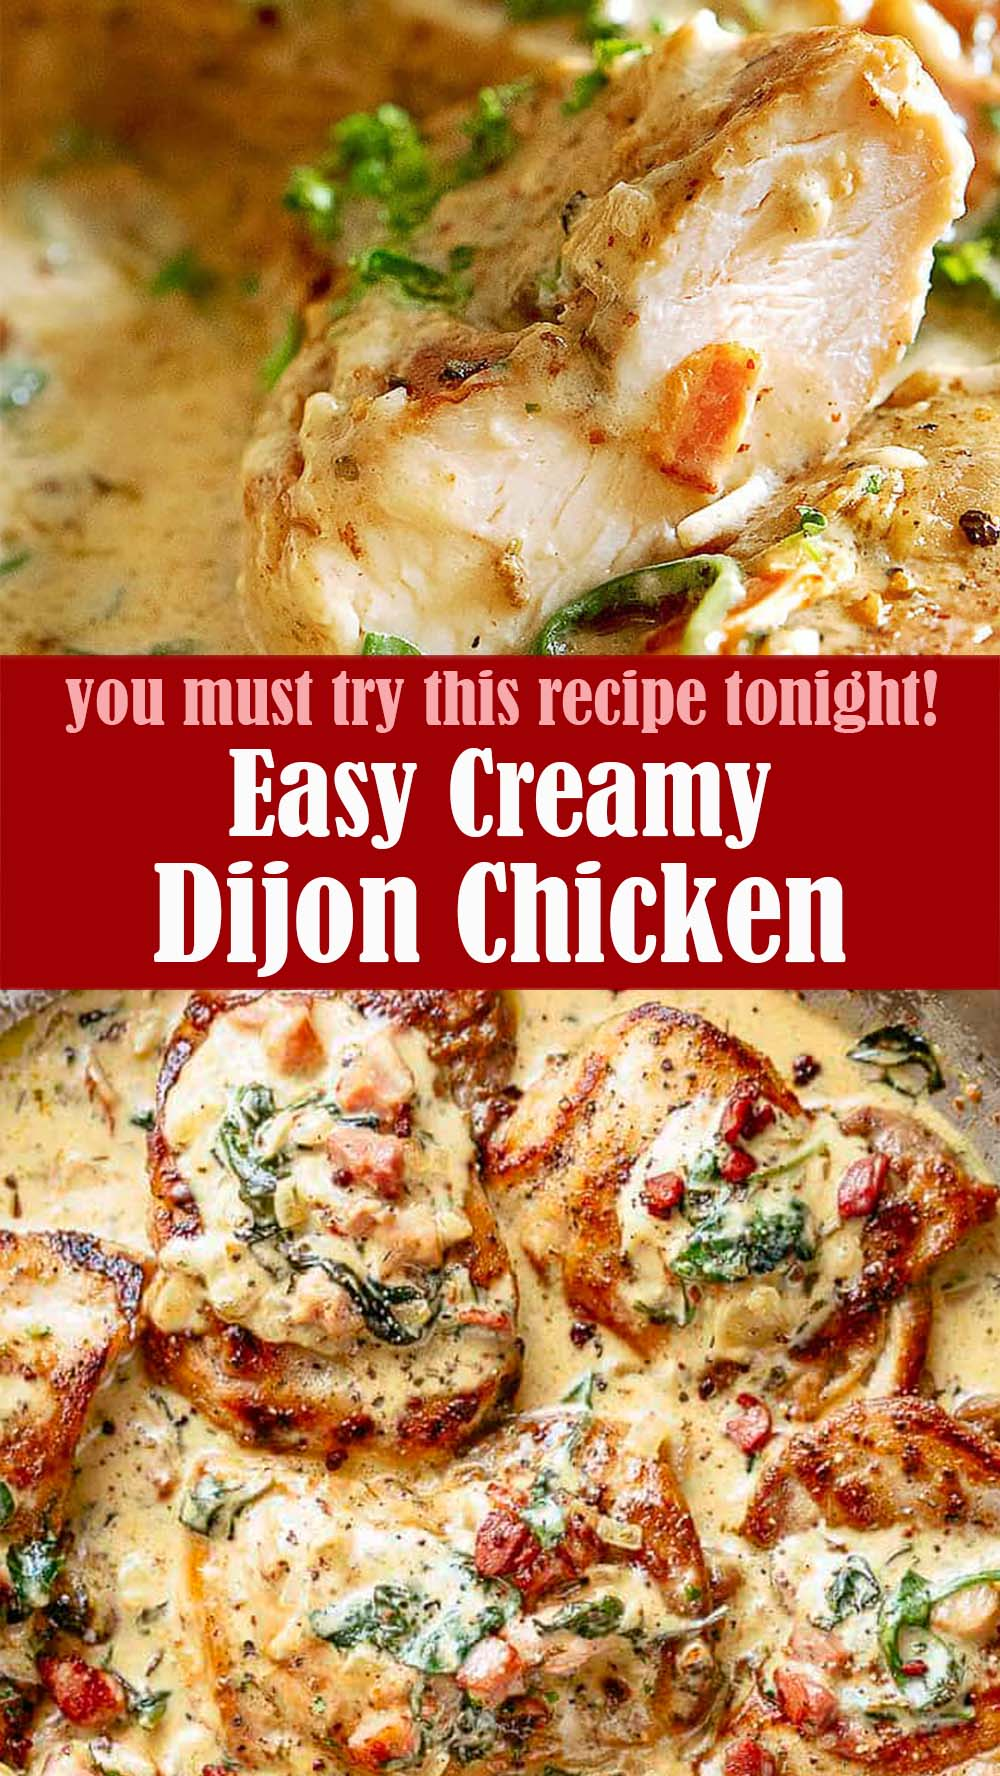 Easy Creamy Dijon Chicken Recipe